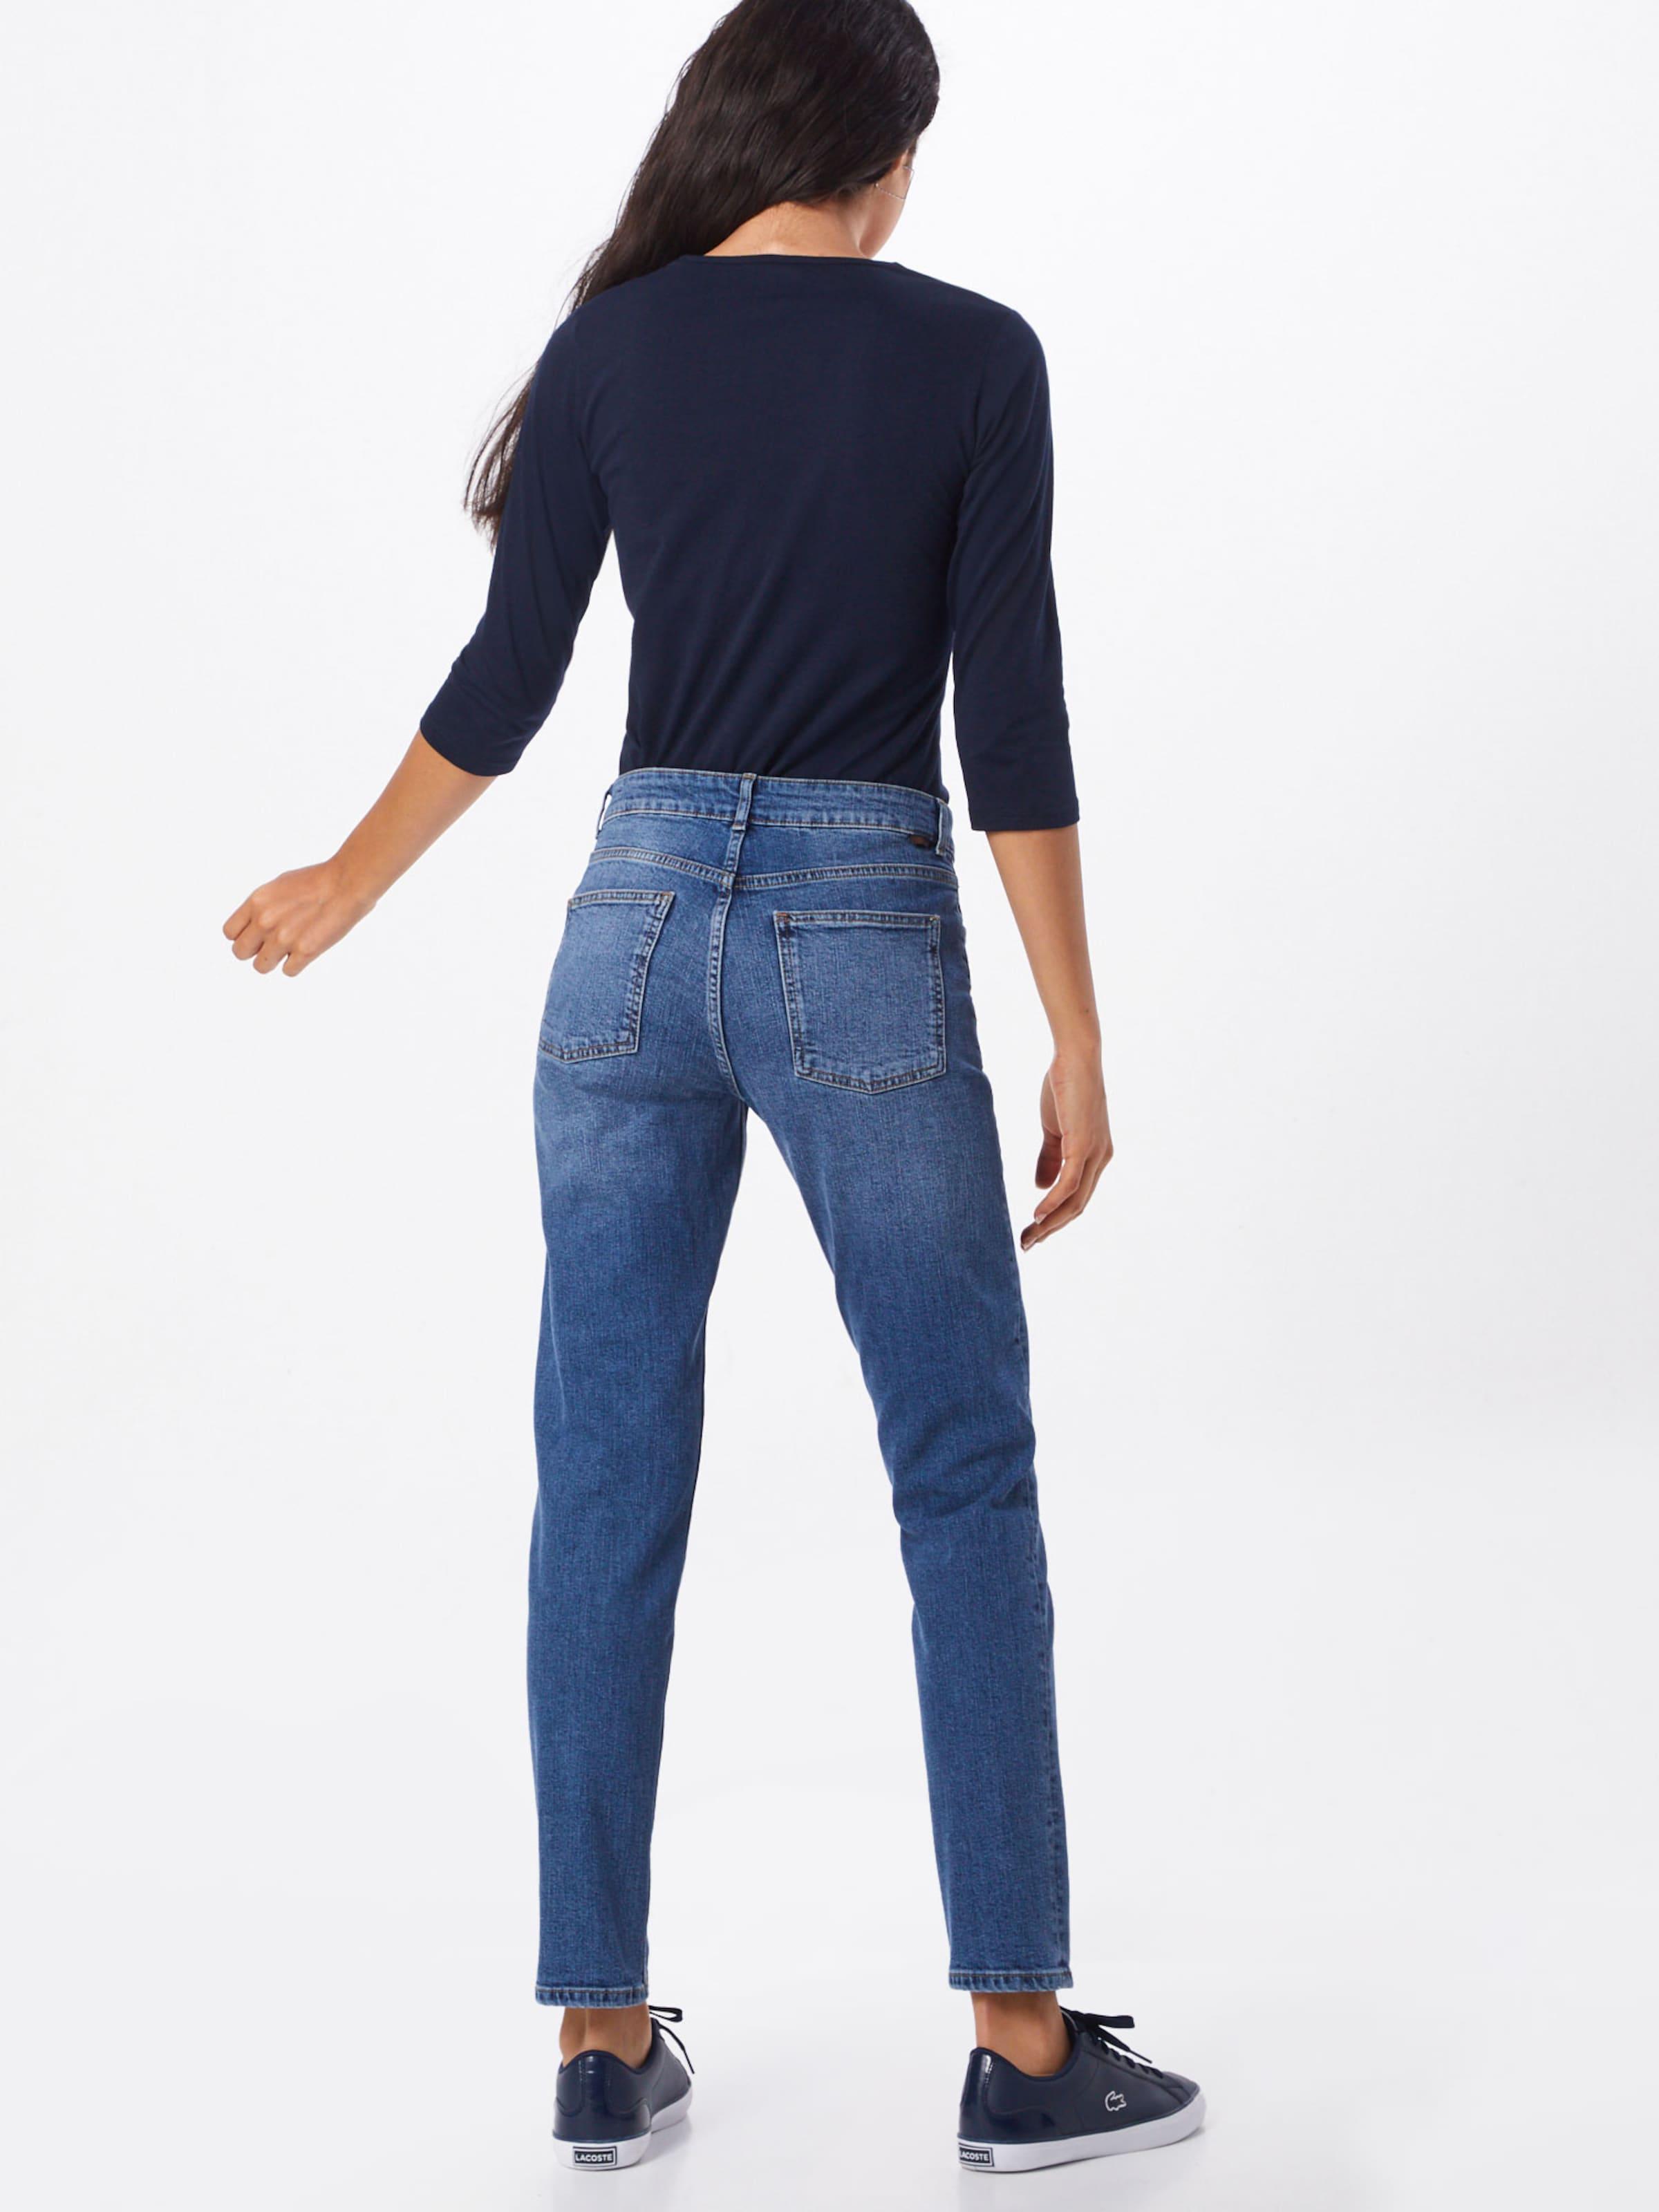 May Jeans Blue Noisy In Denim 'jenna' PuiXkZ